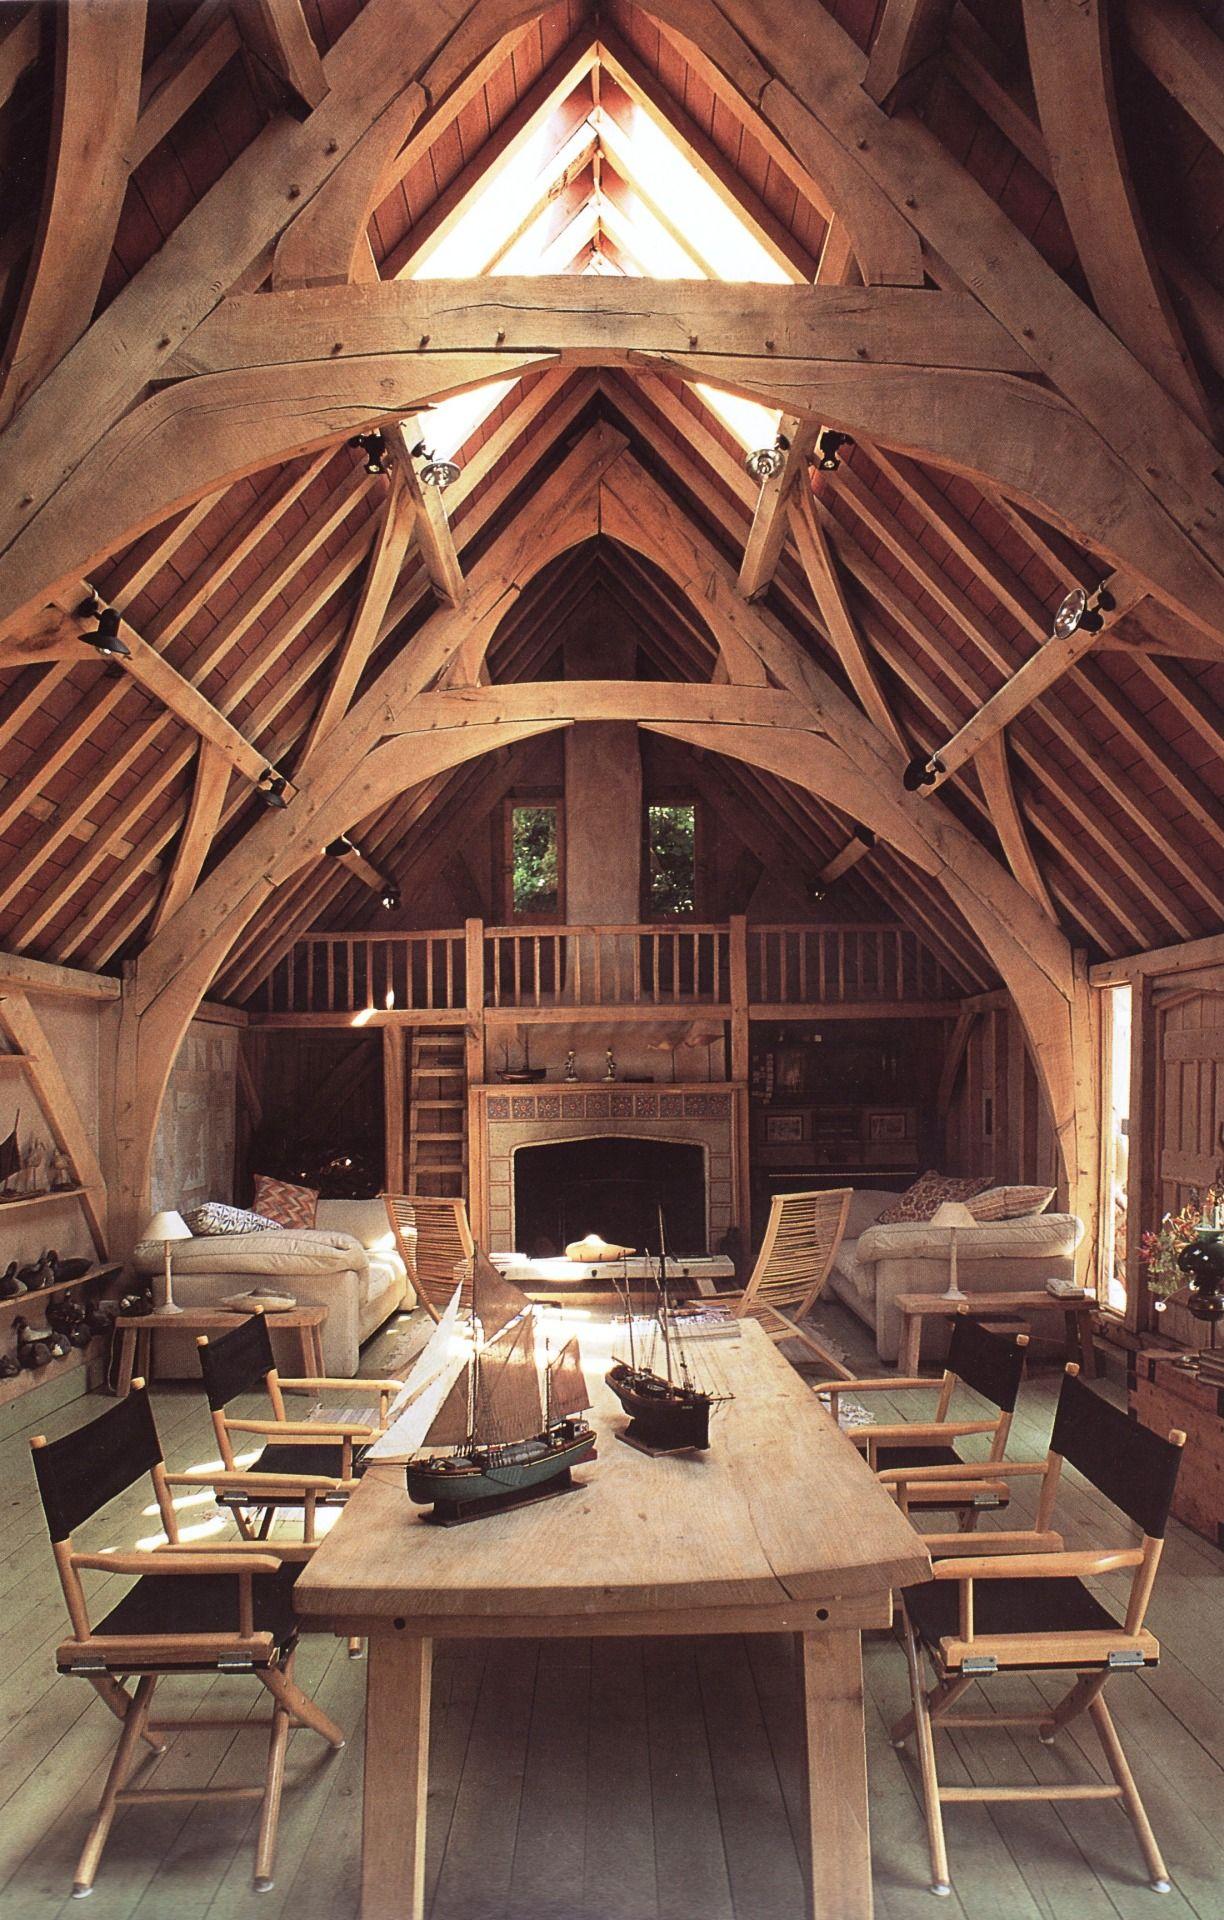 Home interior frames the ucseagull houseud in devon england it was  devon england